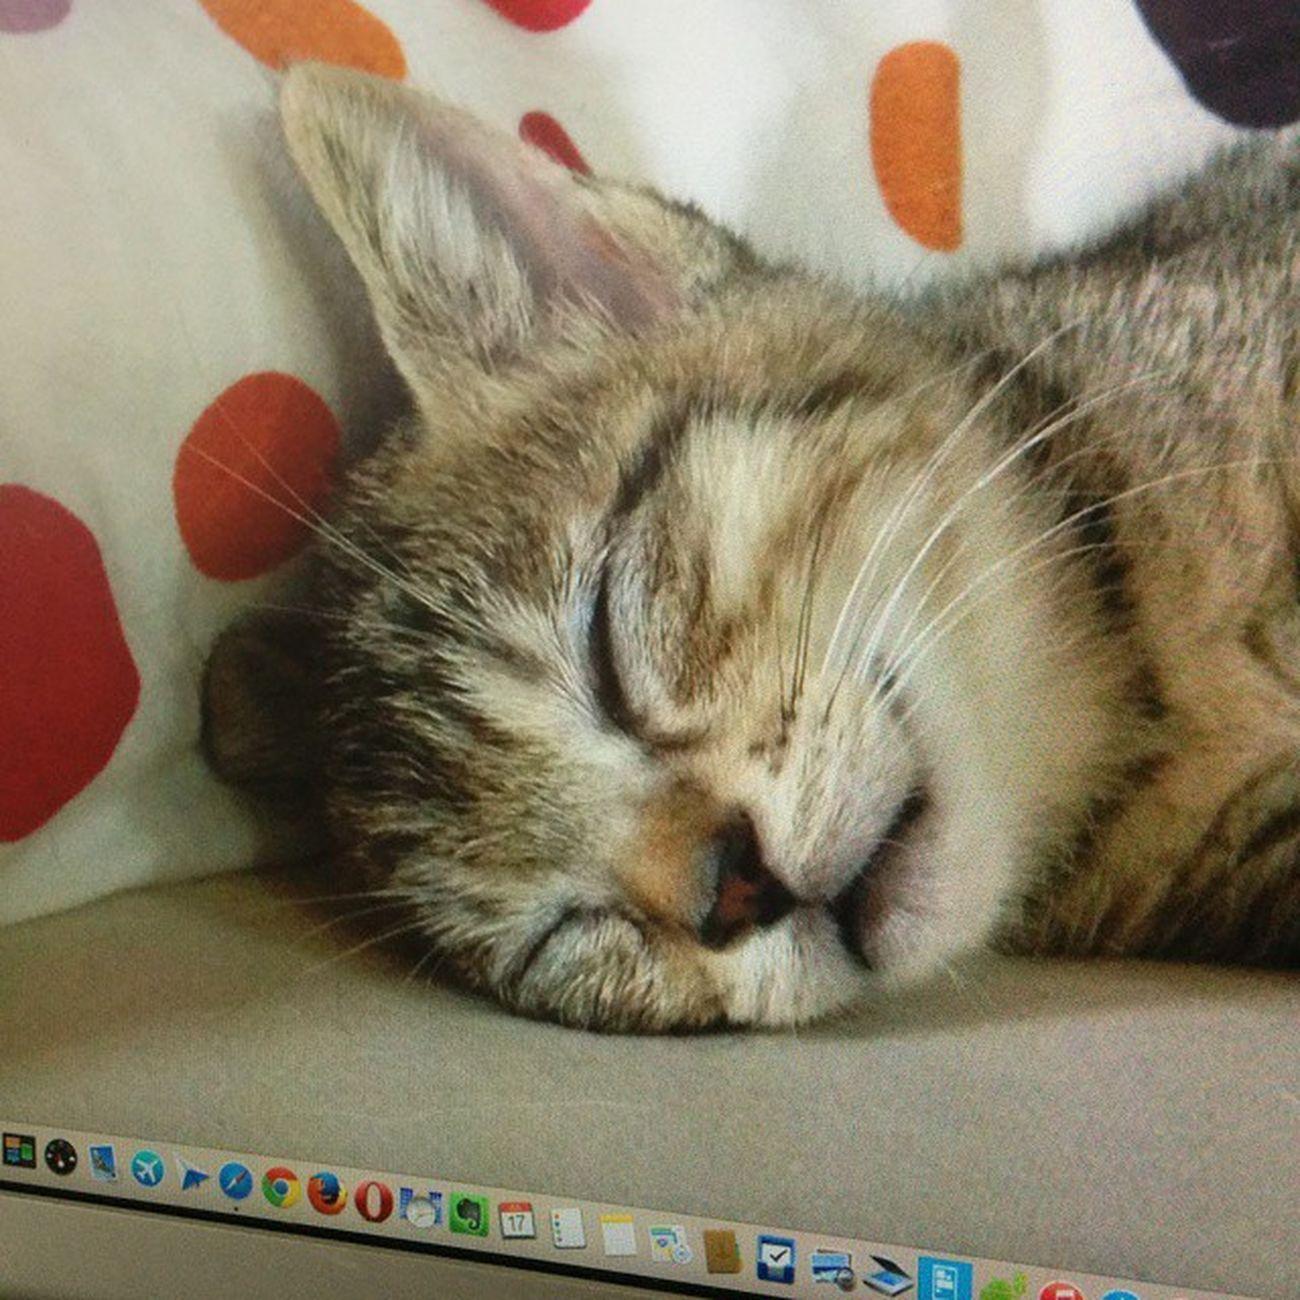 Mac Desktop 壁紙 どたま祭 cat neko ねこ 猫 ネコ cats teto tetoko キジトラ テト 家のMac miniの壁紙のテトでおはようございます??